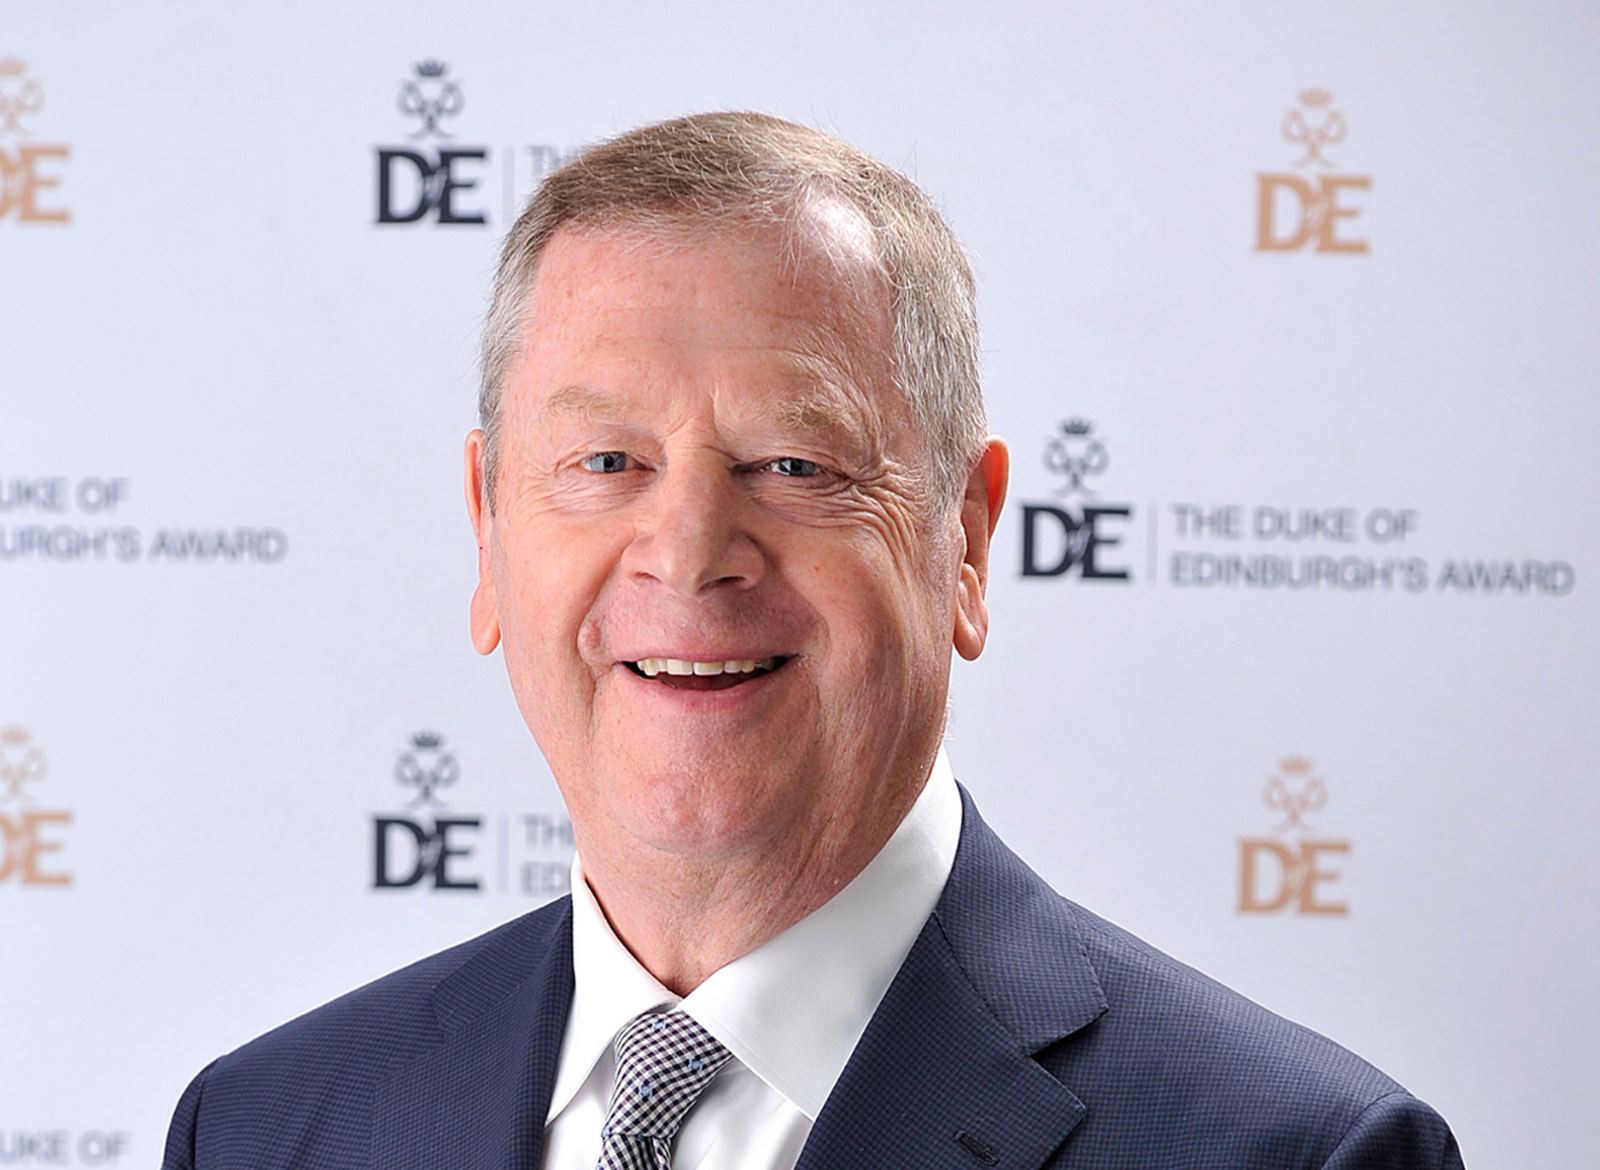 The Lord Kirkham CVO Chair of Trustees at The Duke of Edinburgh's Awards